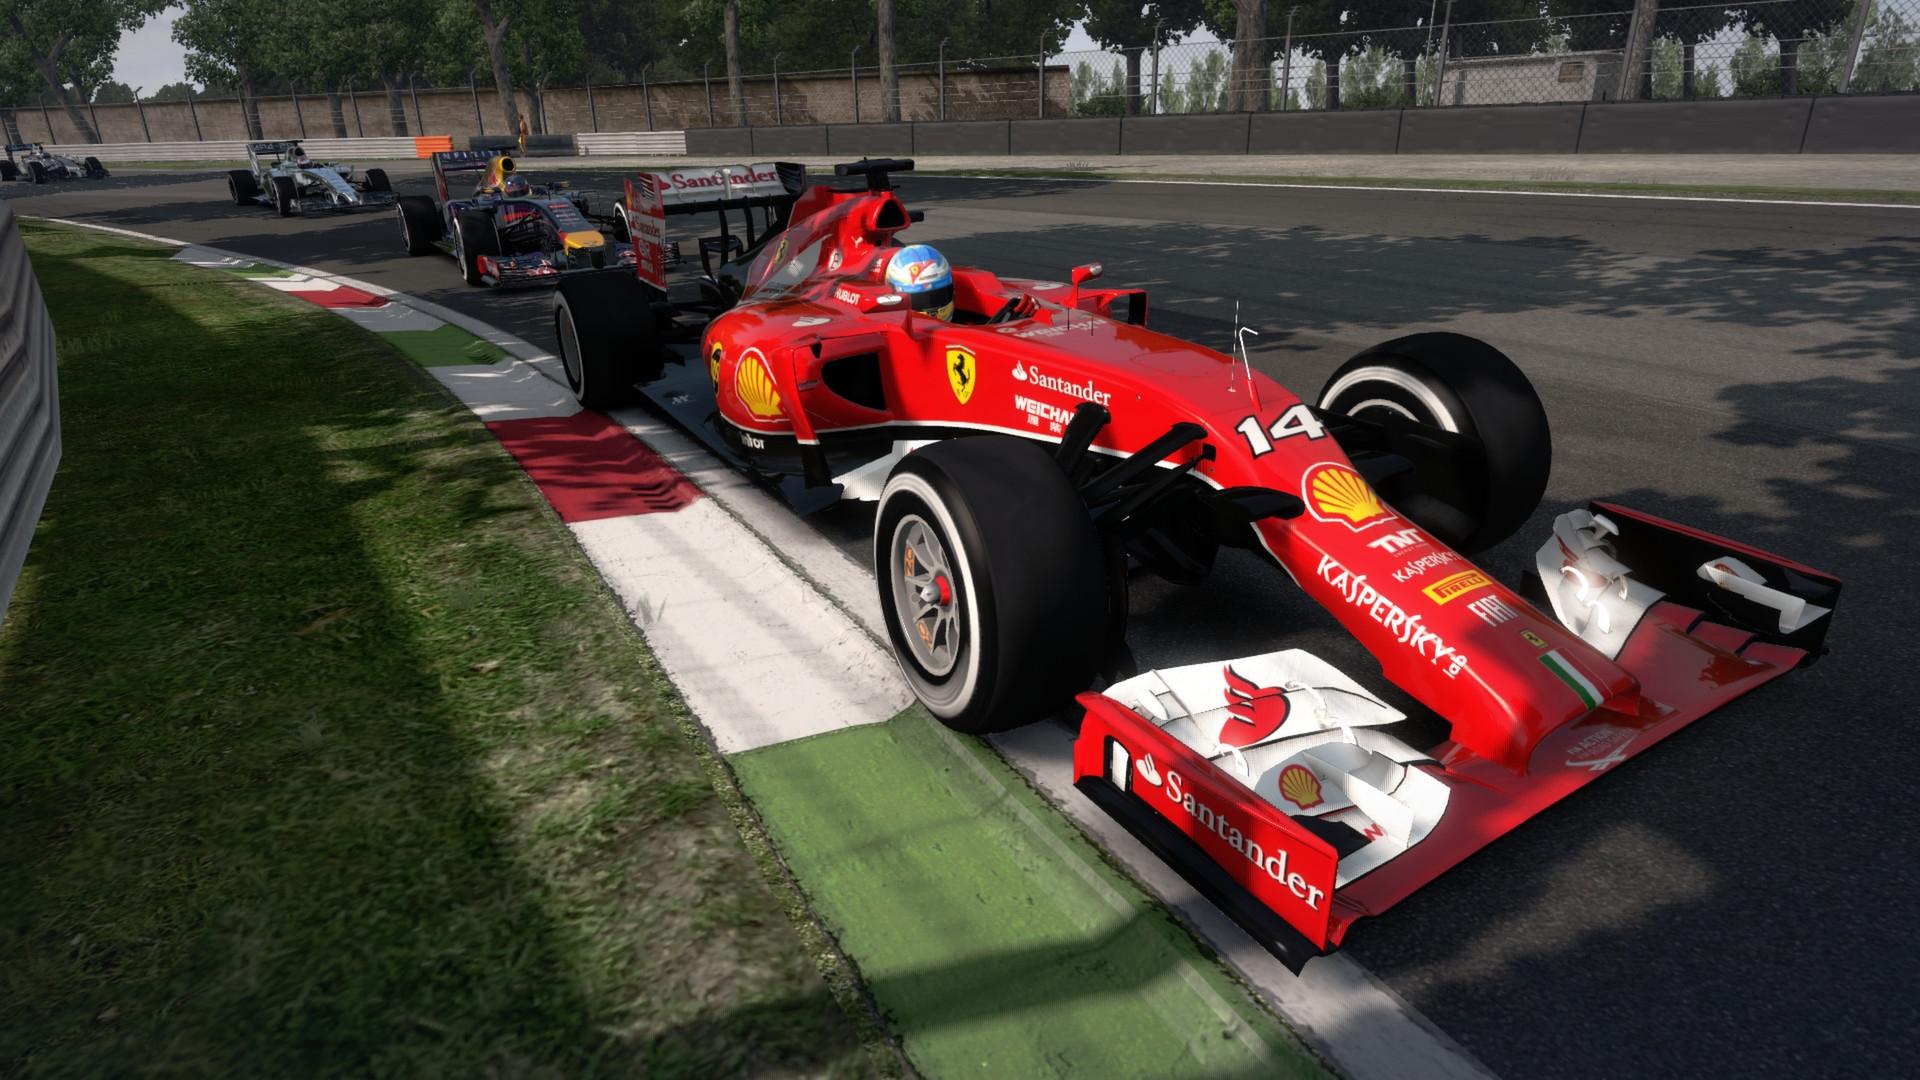 F1 2014 | ROW (a94e44e9-cff3-4551-99e4-2efa2e89d995)